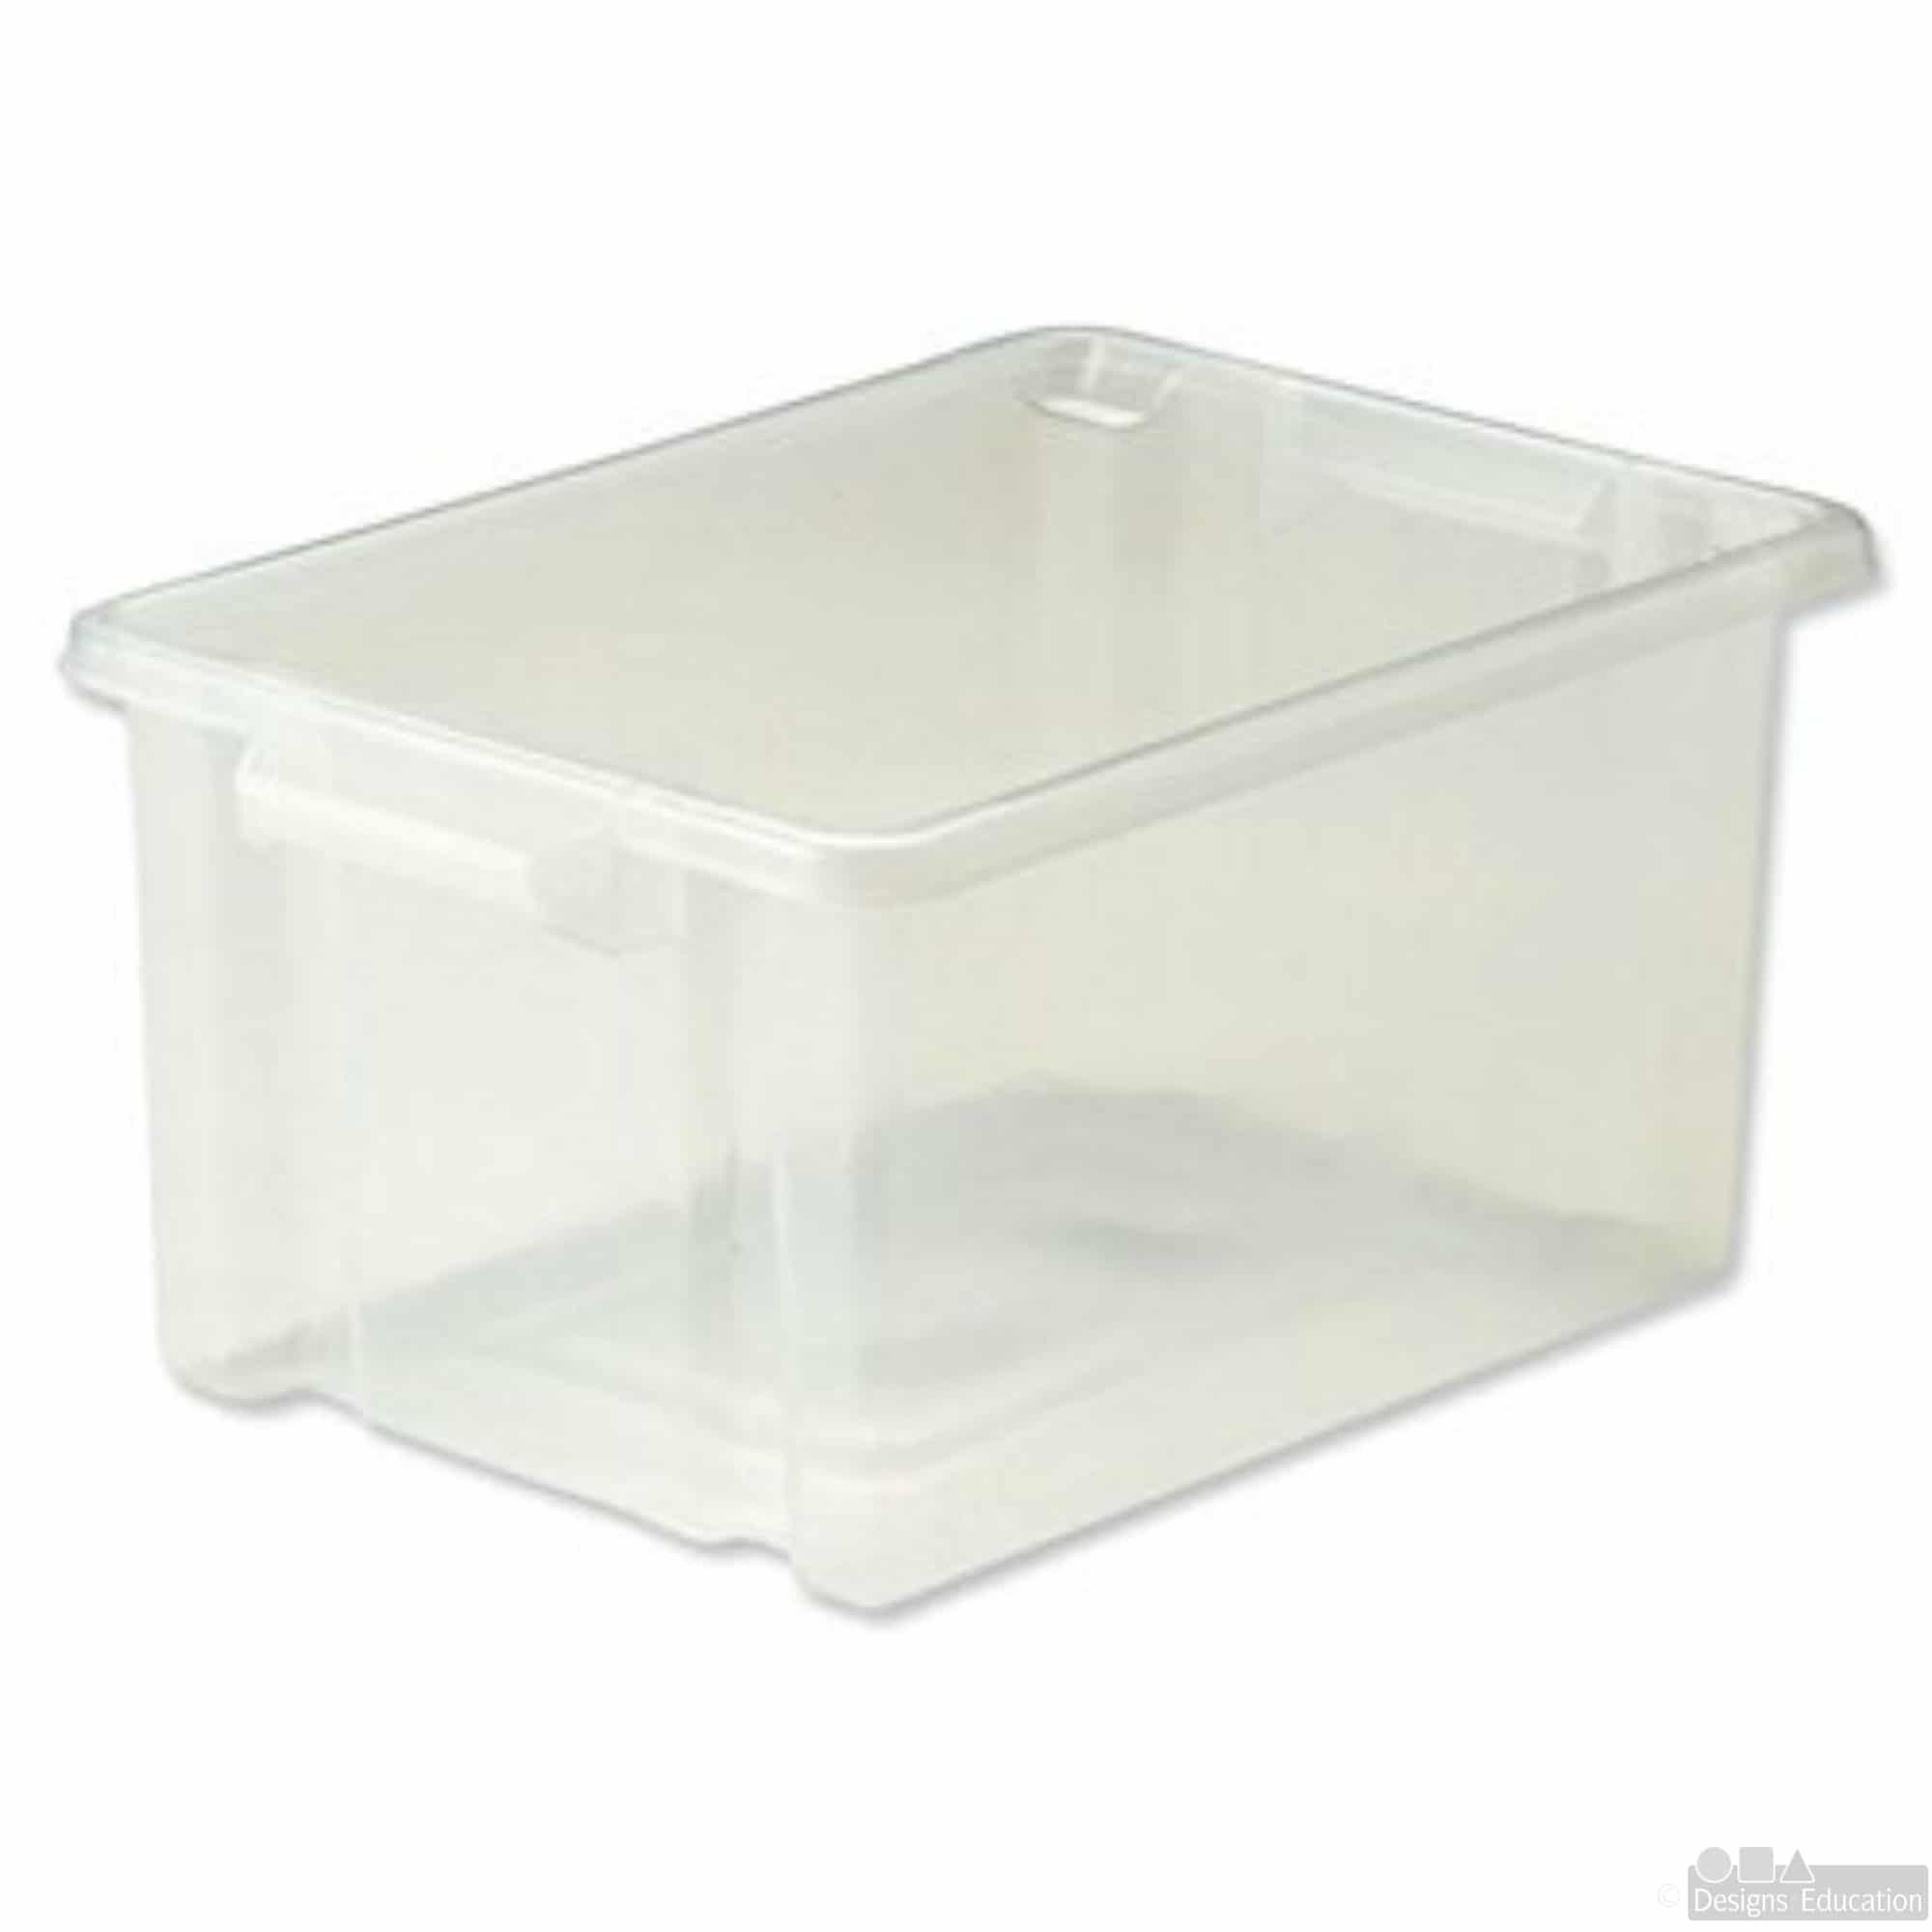 black plano bernsport storage tub small tubs open